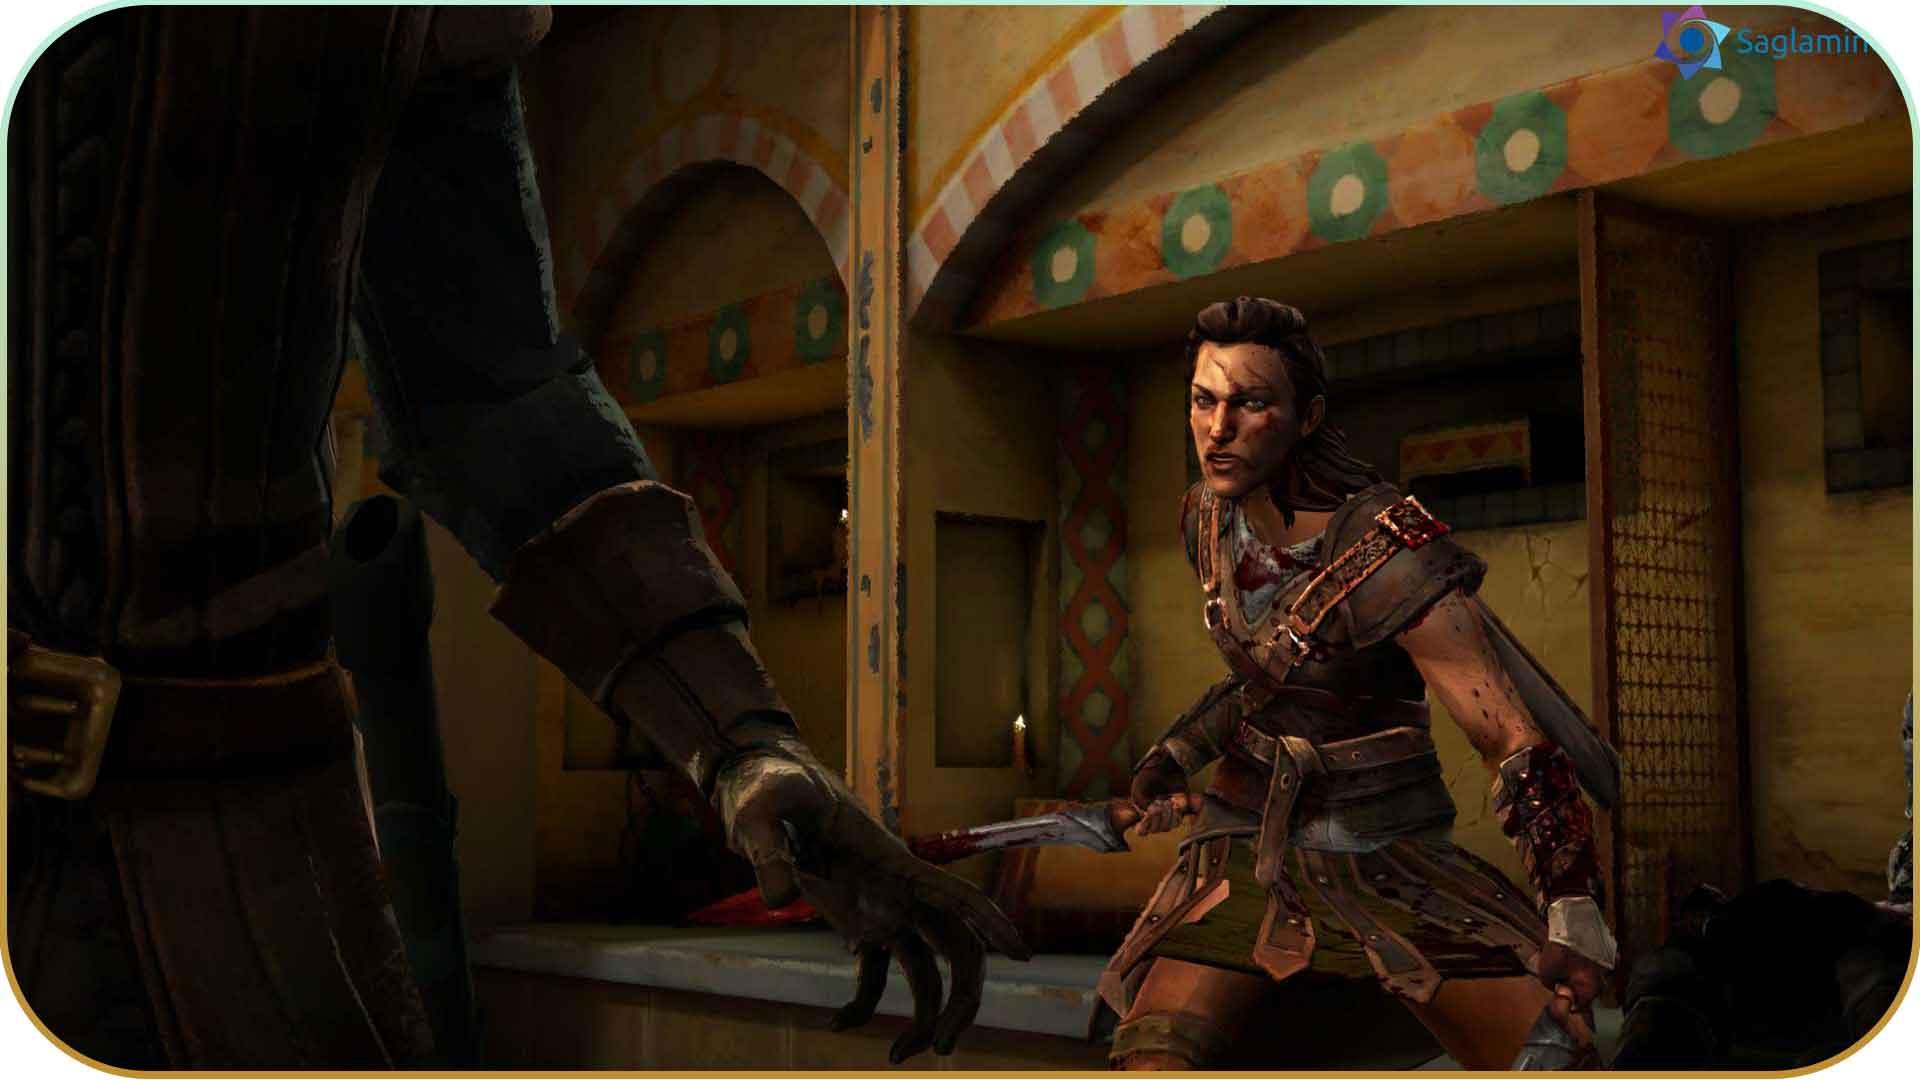 Game of Thrones A Telltale Games Series full indir